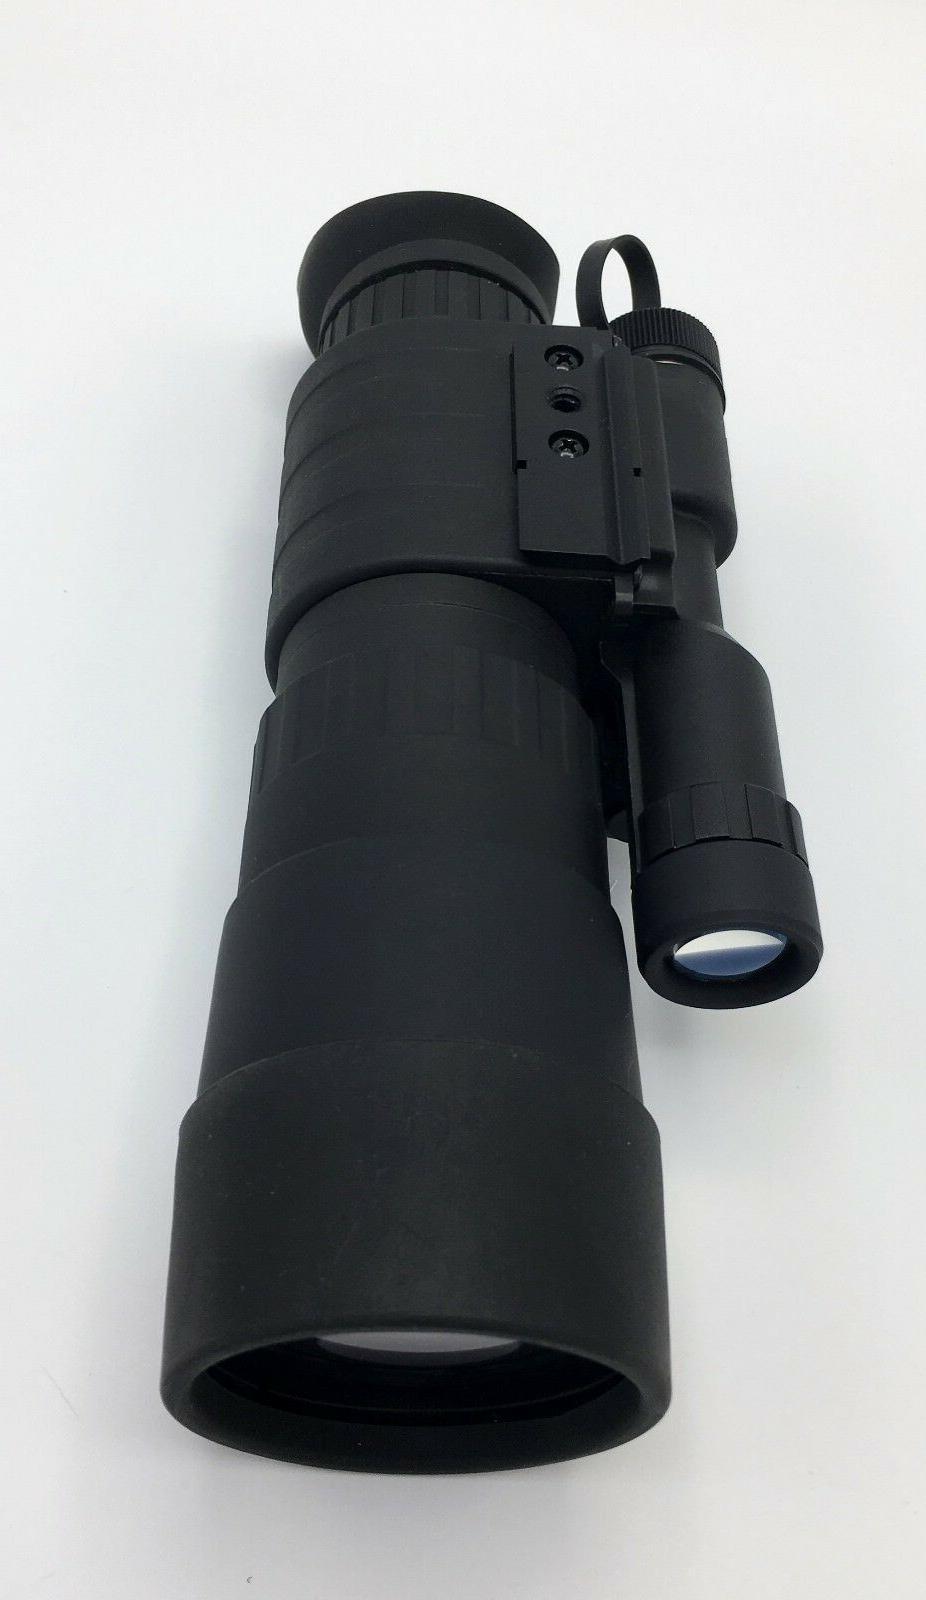 Pulsar® Vision Infrared/IR 3.5x50mm